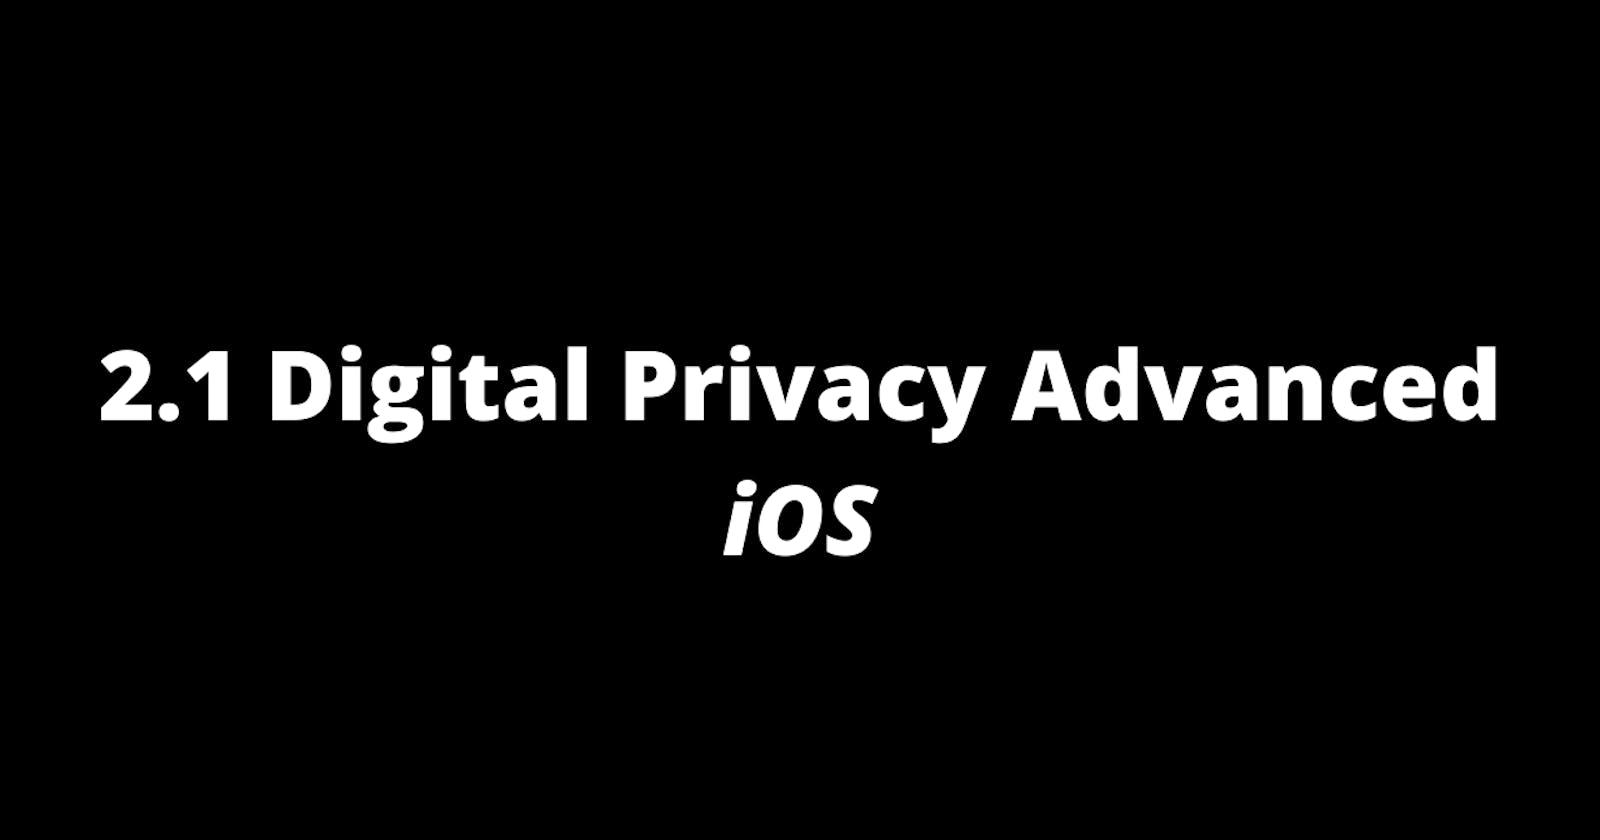 2.1 Digital Privacy Advanced: iOS